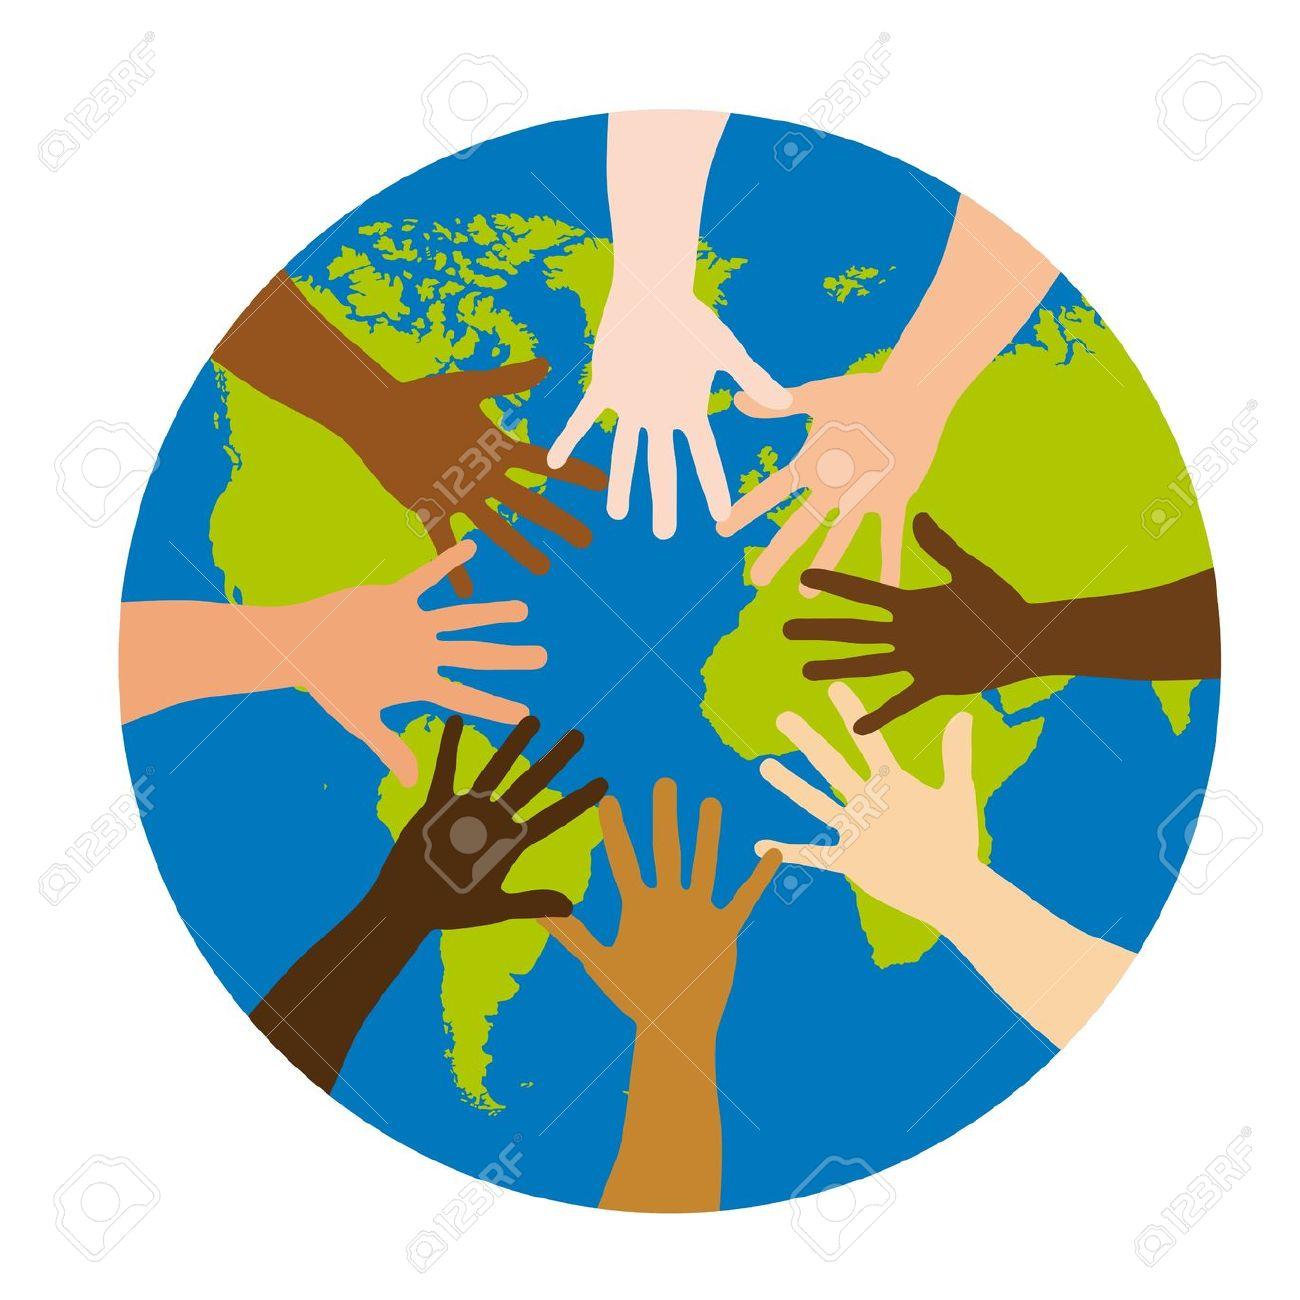 multicultural: diversity over .